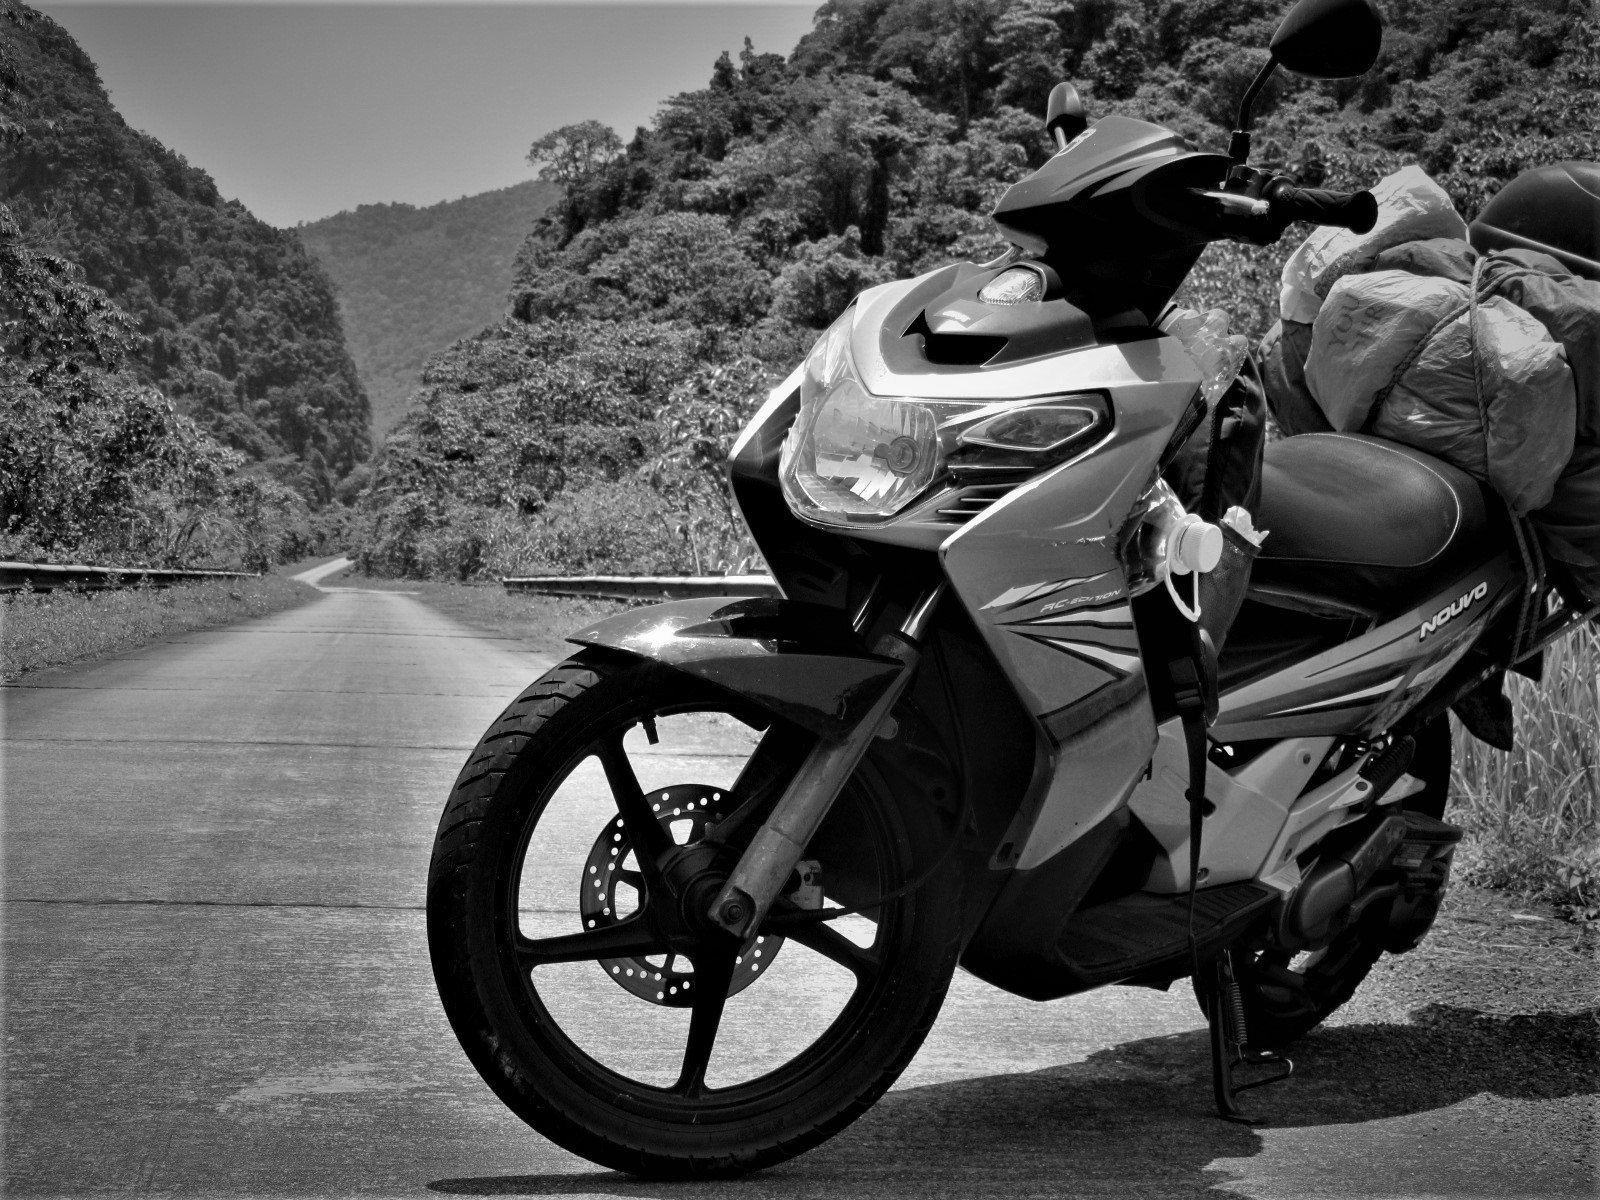 My Motorbike, Stavros, 200,000km in Vietnam